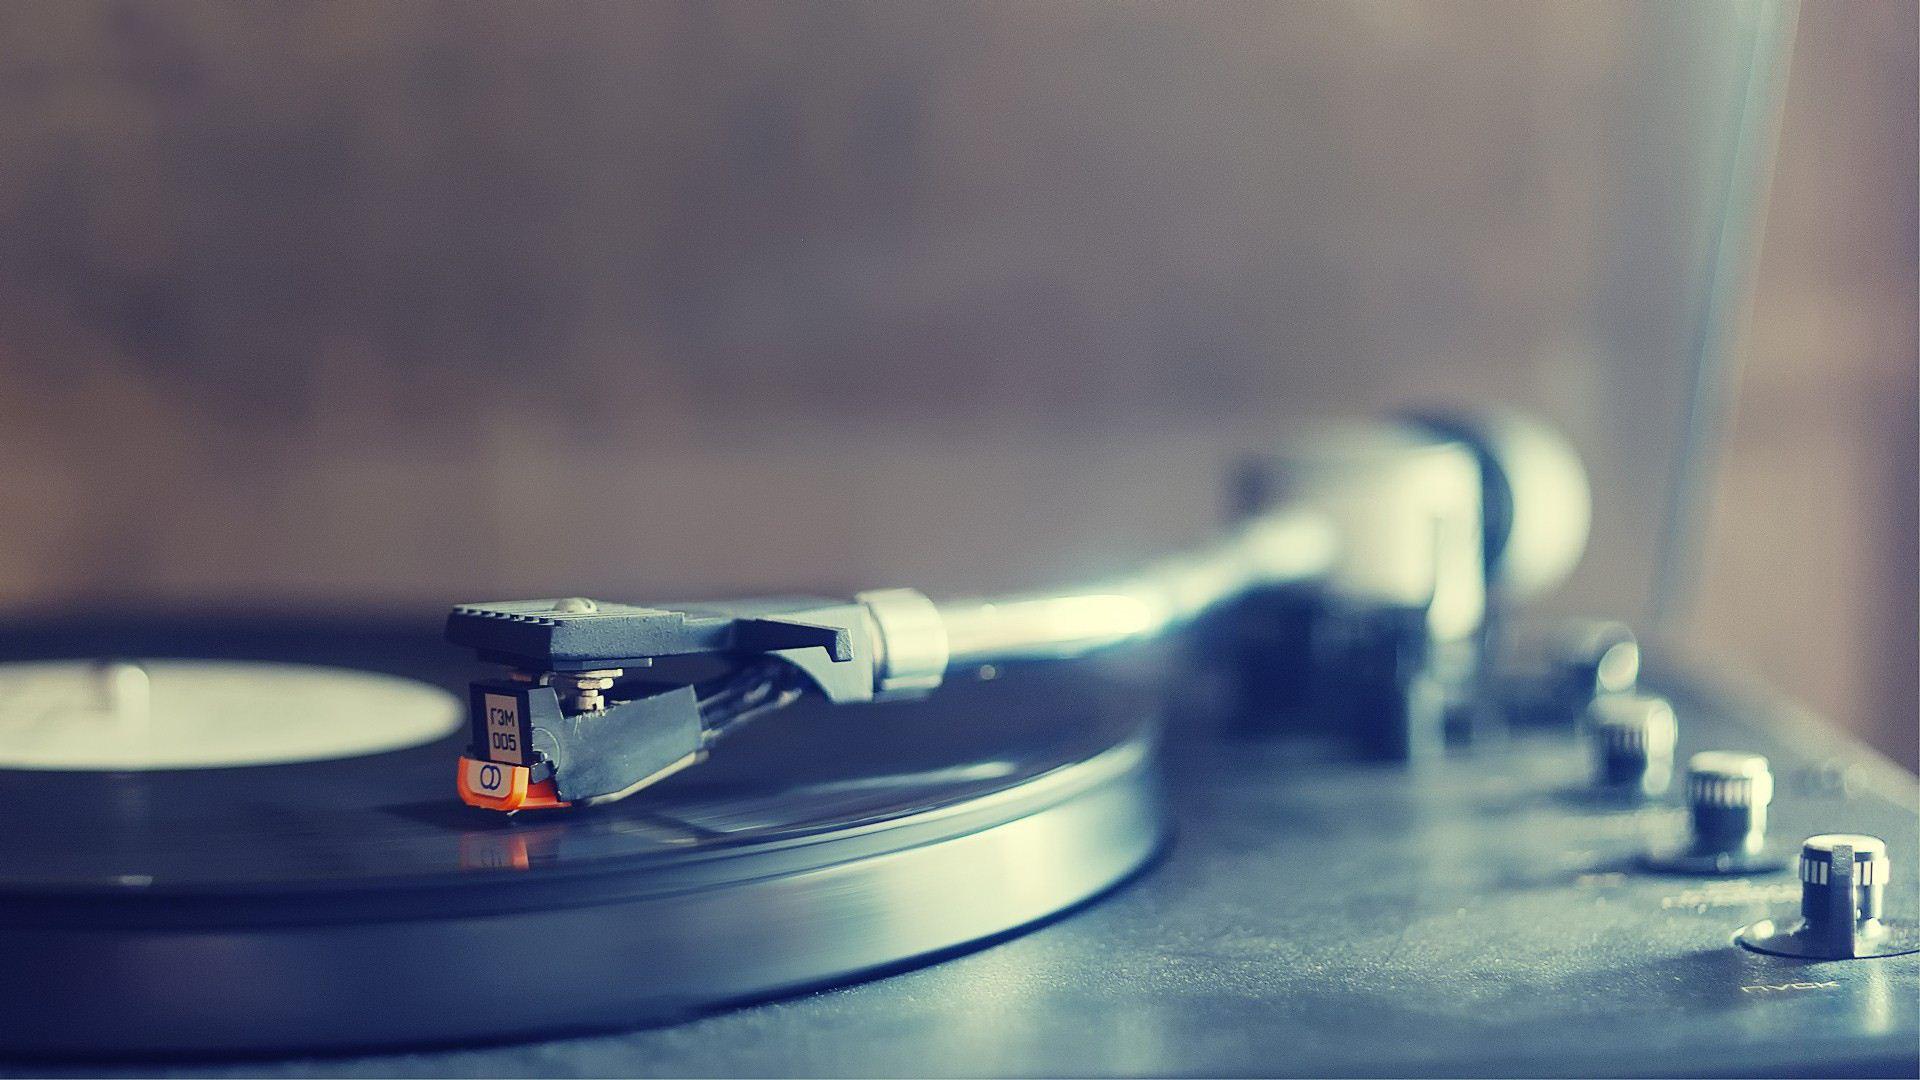 Phonograph Full Hd Wallpaper And Hintergrund 1920x1080